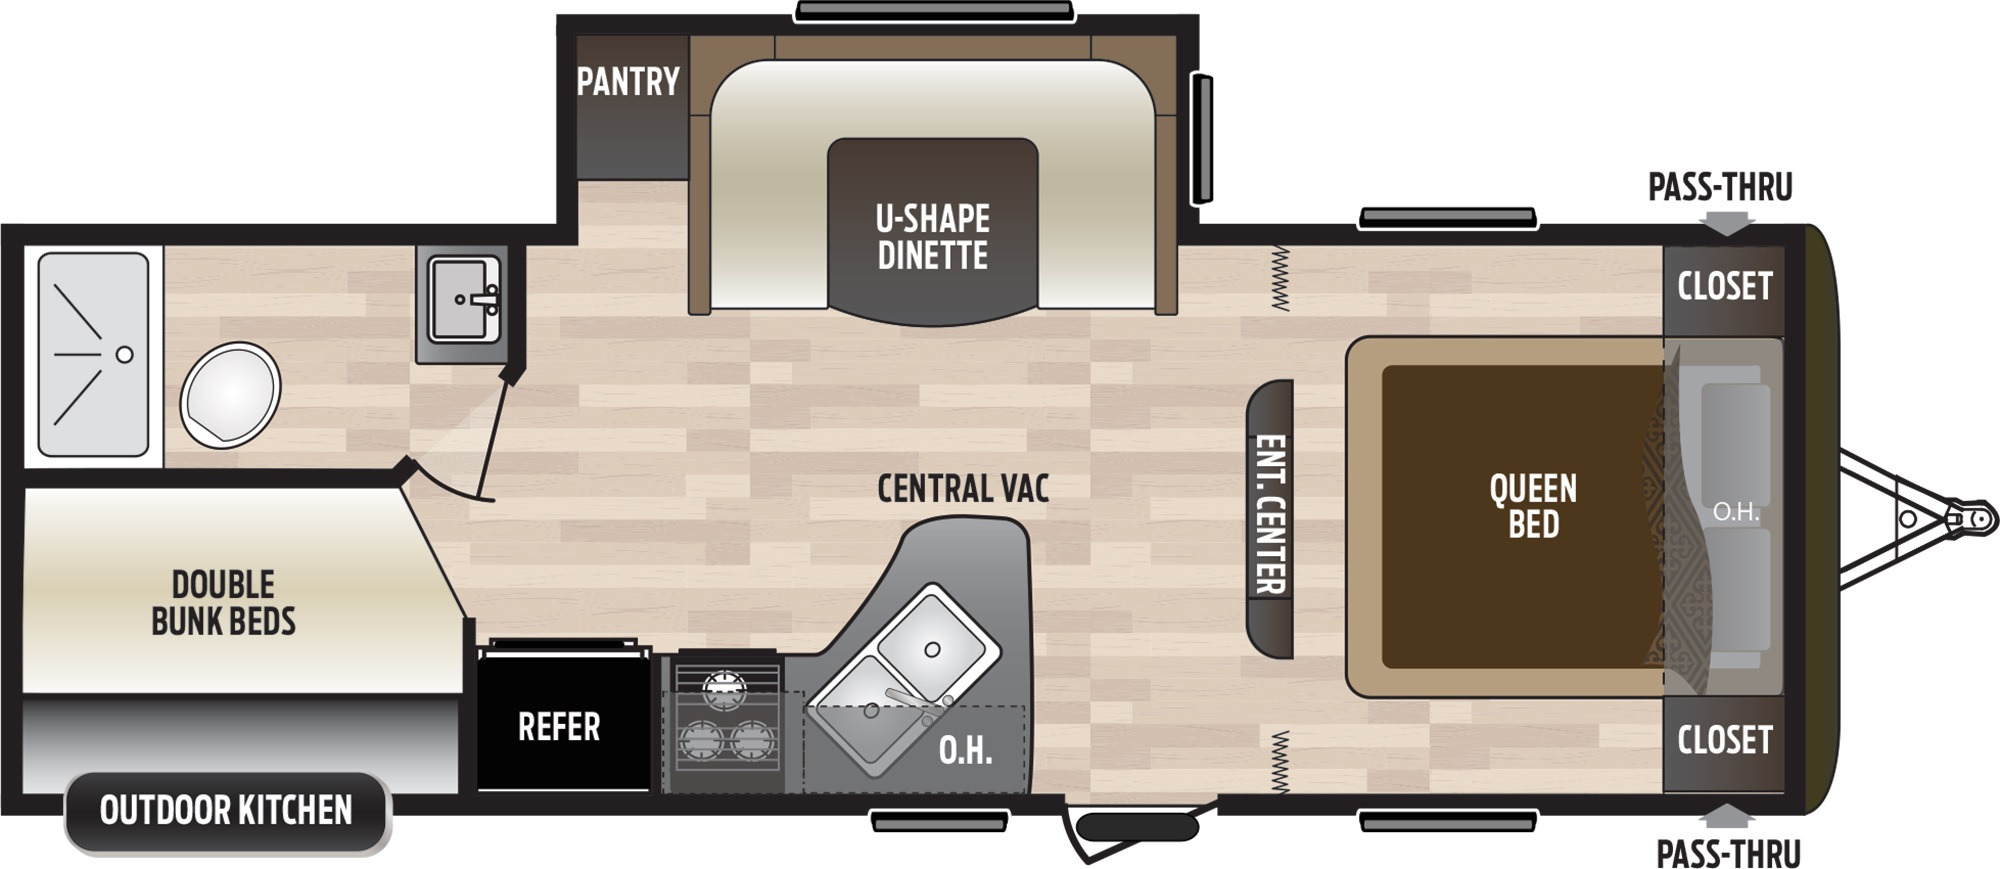 View Floor Plan for 2020 KEYSTONE HIDEOUT 245LHSWE